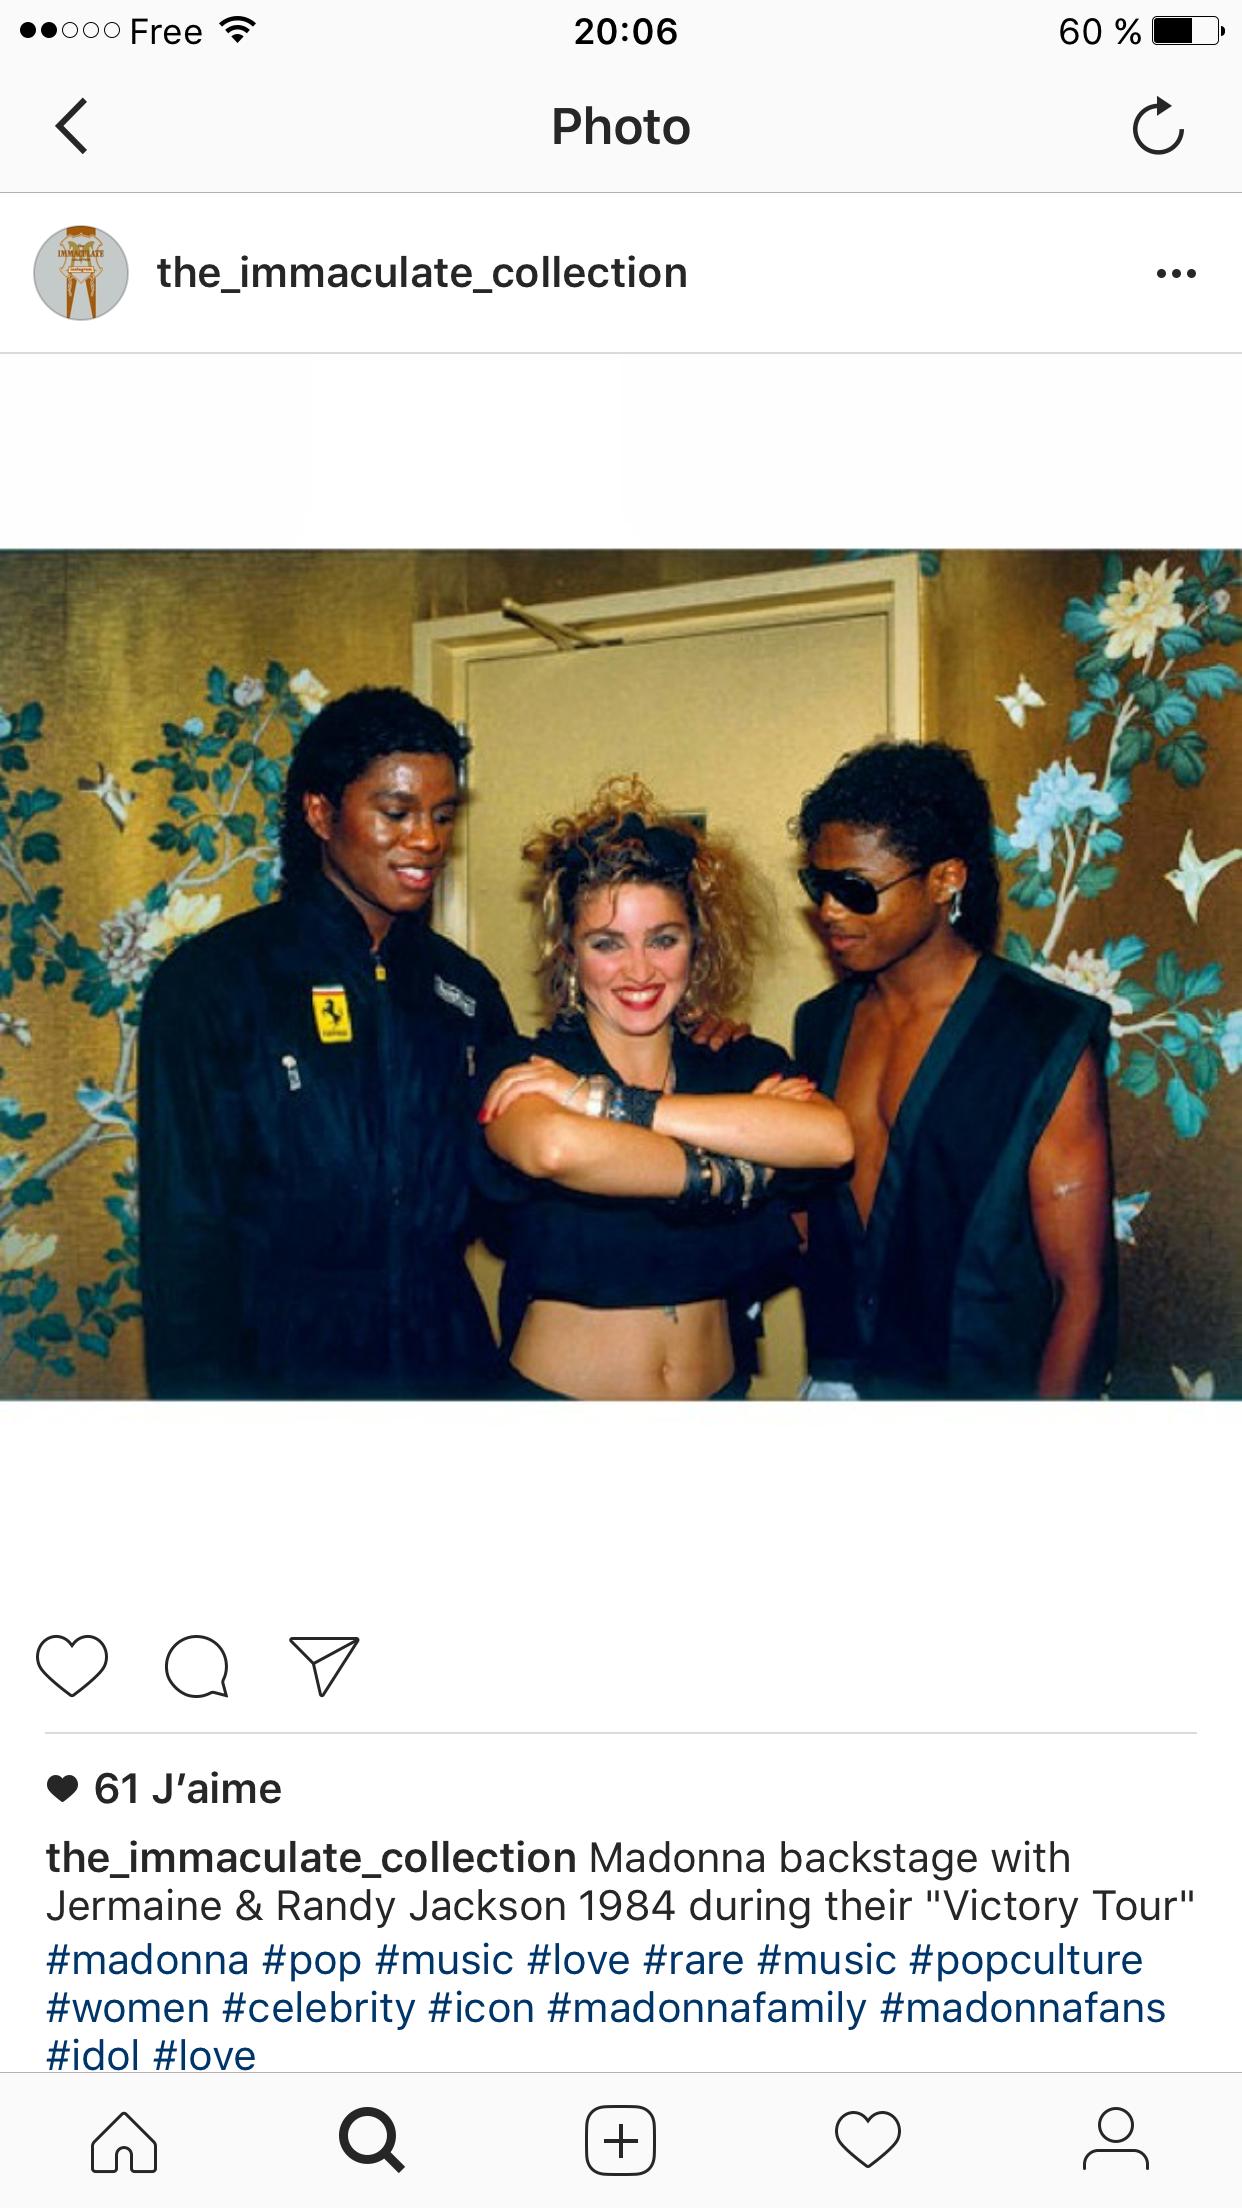 Madonna and the Jacksons